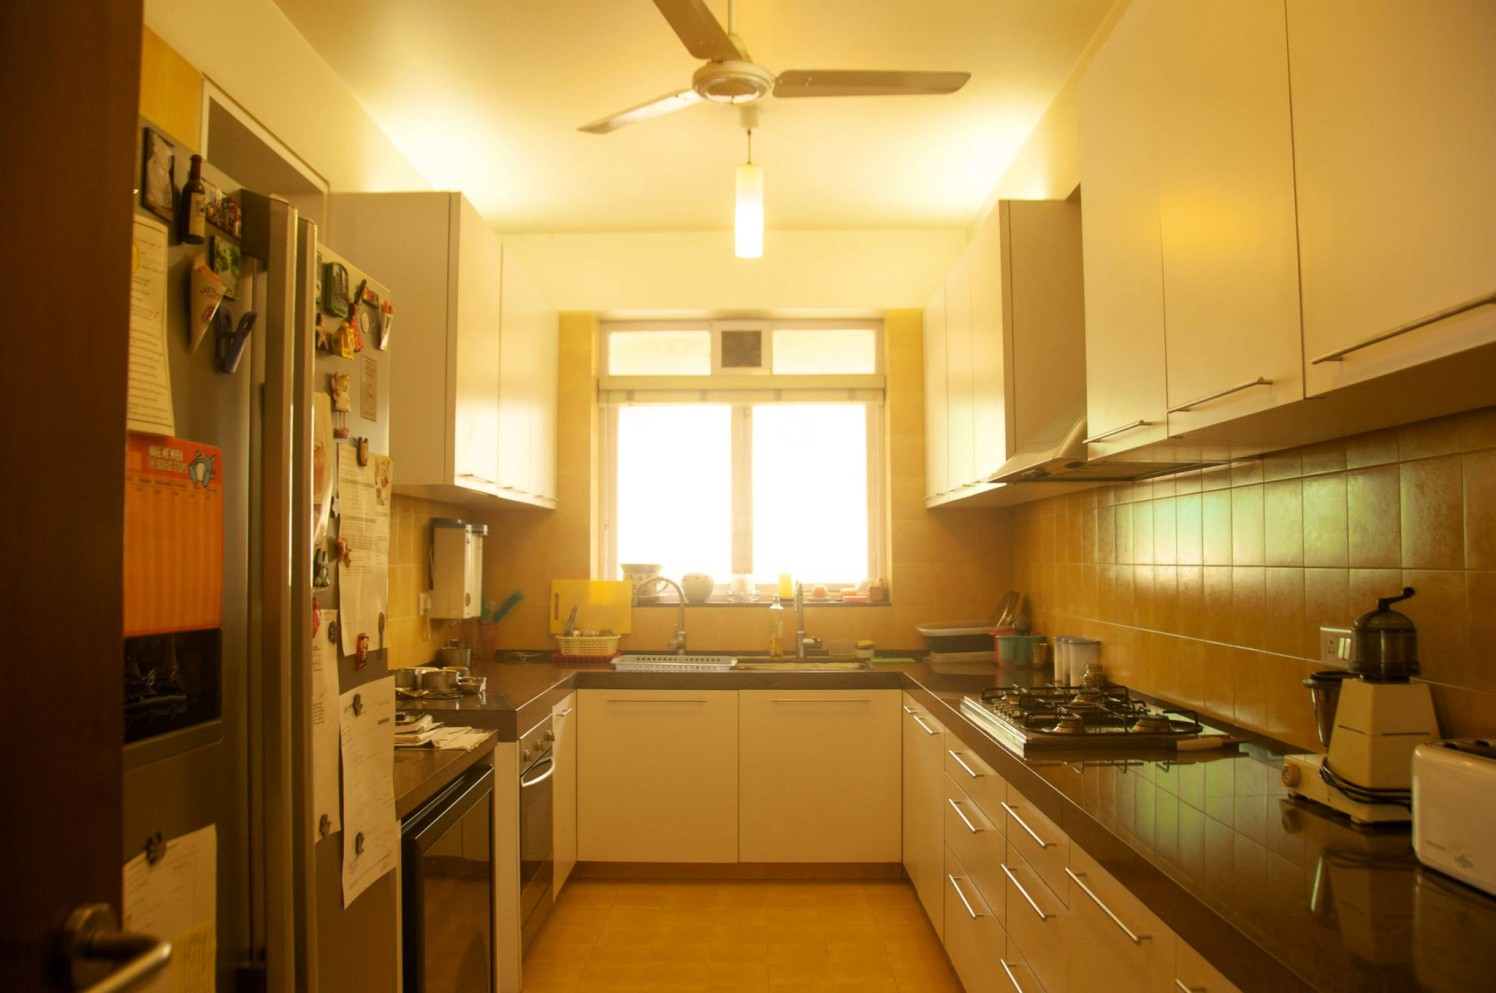 Spacious Modular Kitchen With White Shaded Cabinets by Viraf Laskari  Modular-kitchen Modern   Interior Design Photos & Ideas